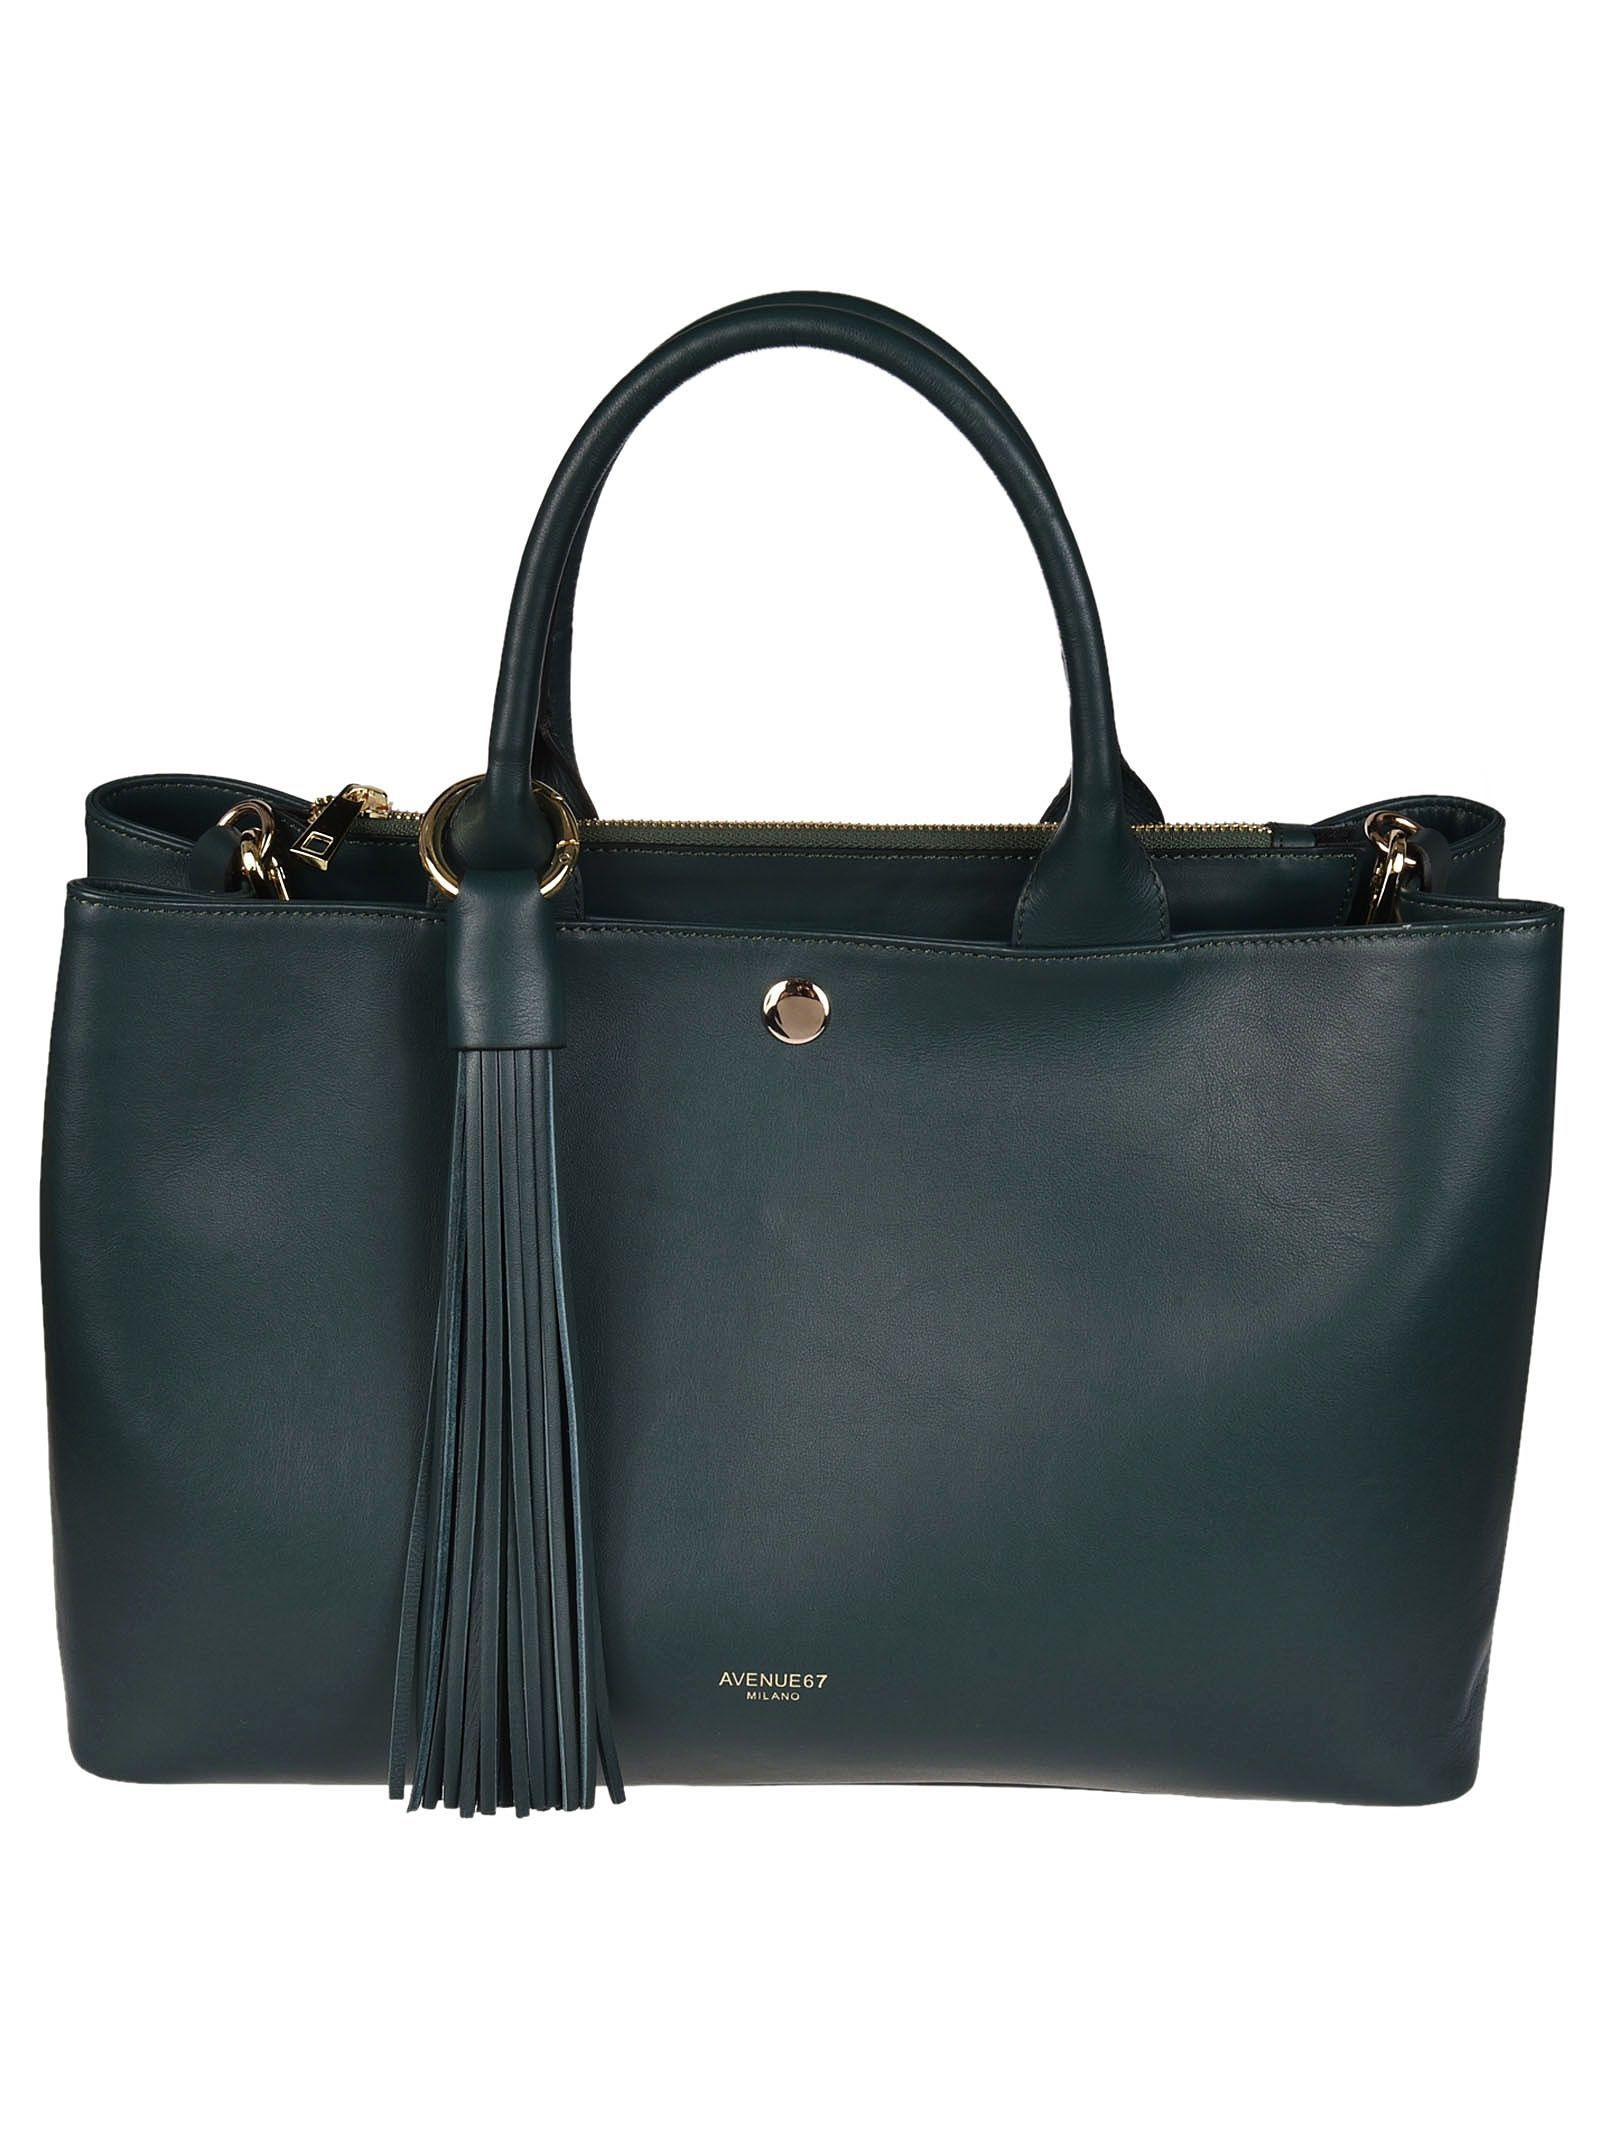 AVENUE 67 NINFEA TOTE.  avenue67  bags  shoulder bags  hand bags  tote   be36b2dce1e